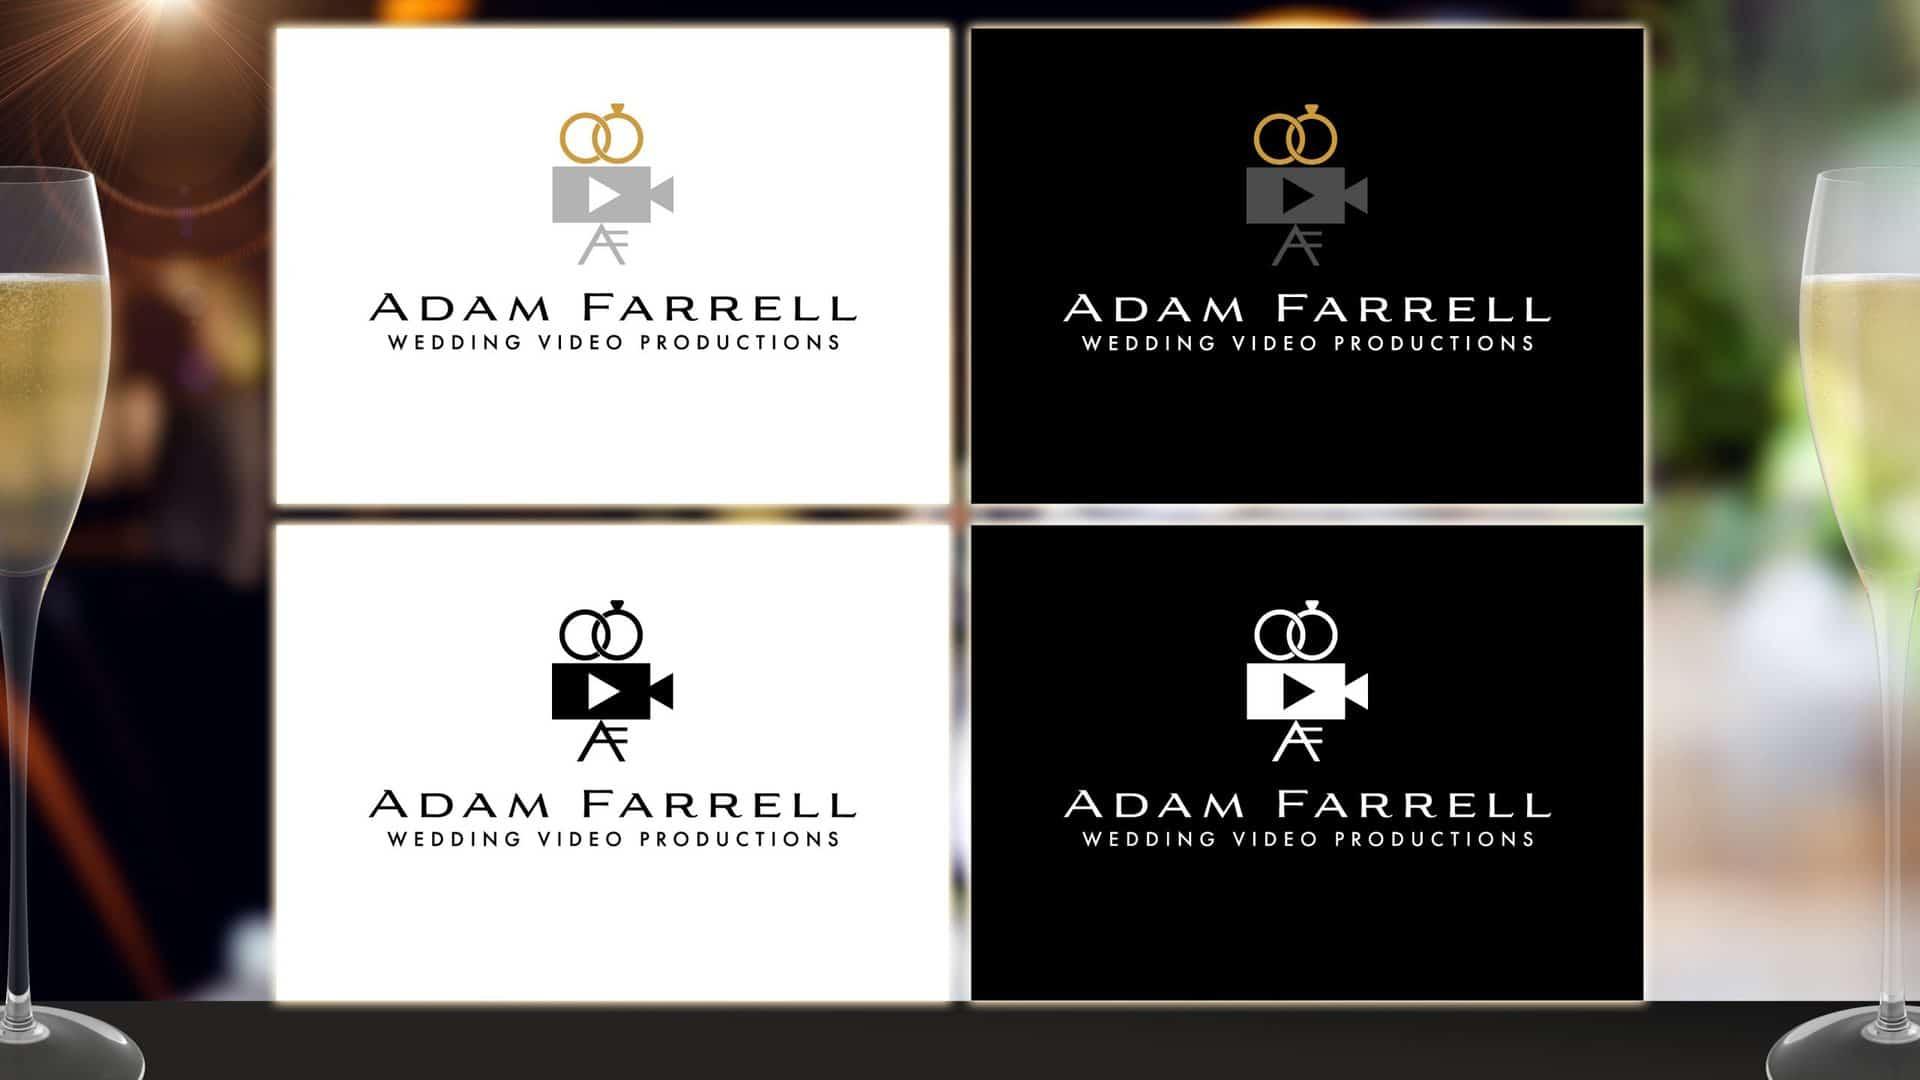 Adam Farrell Work Image 3